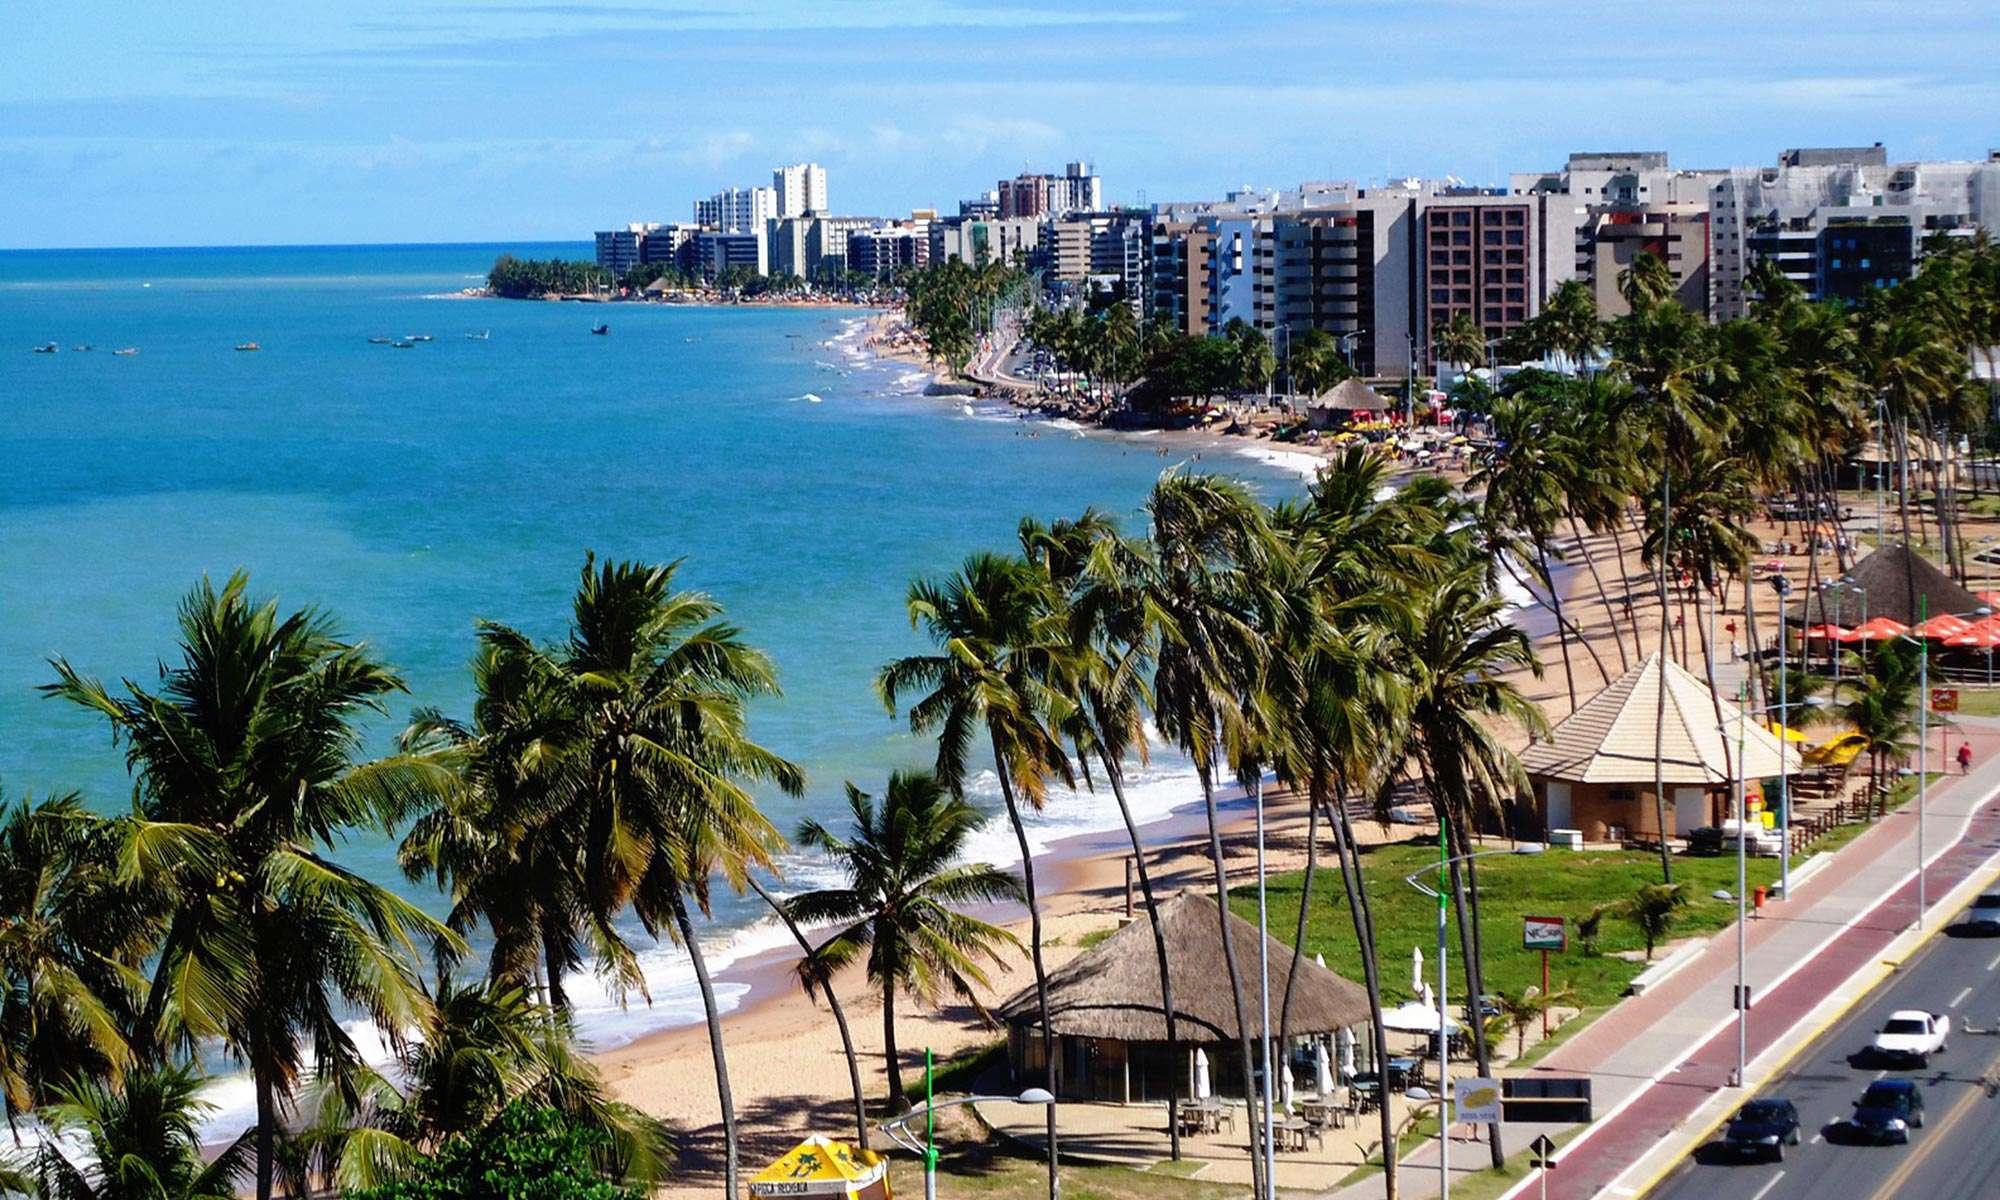 Orla marítima da Jatiúca, Maceió Alagoas